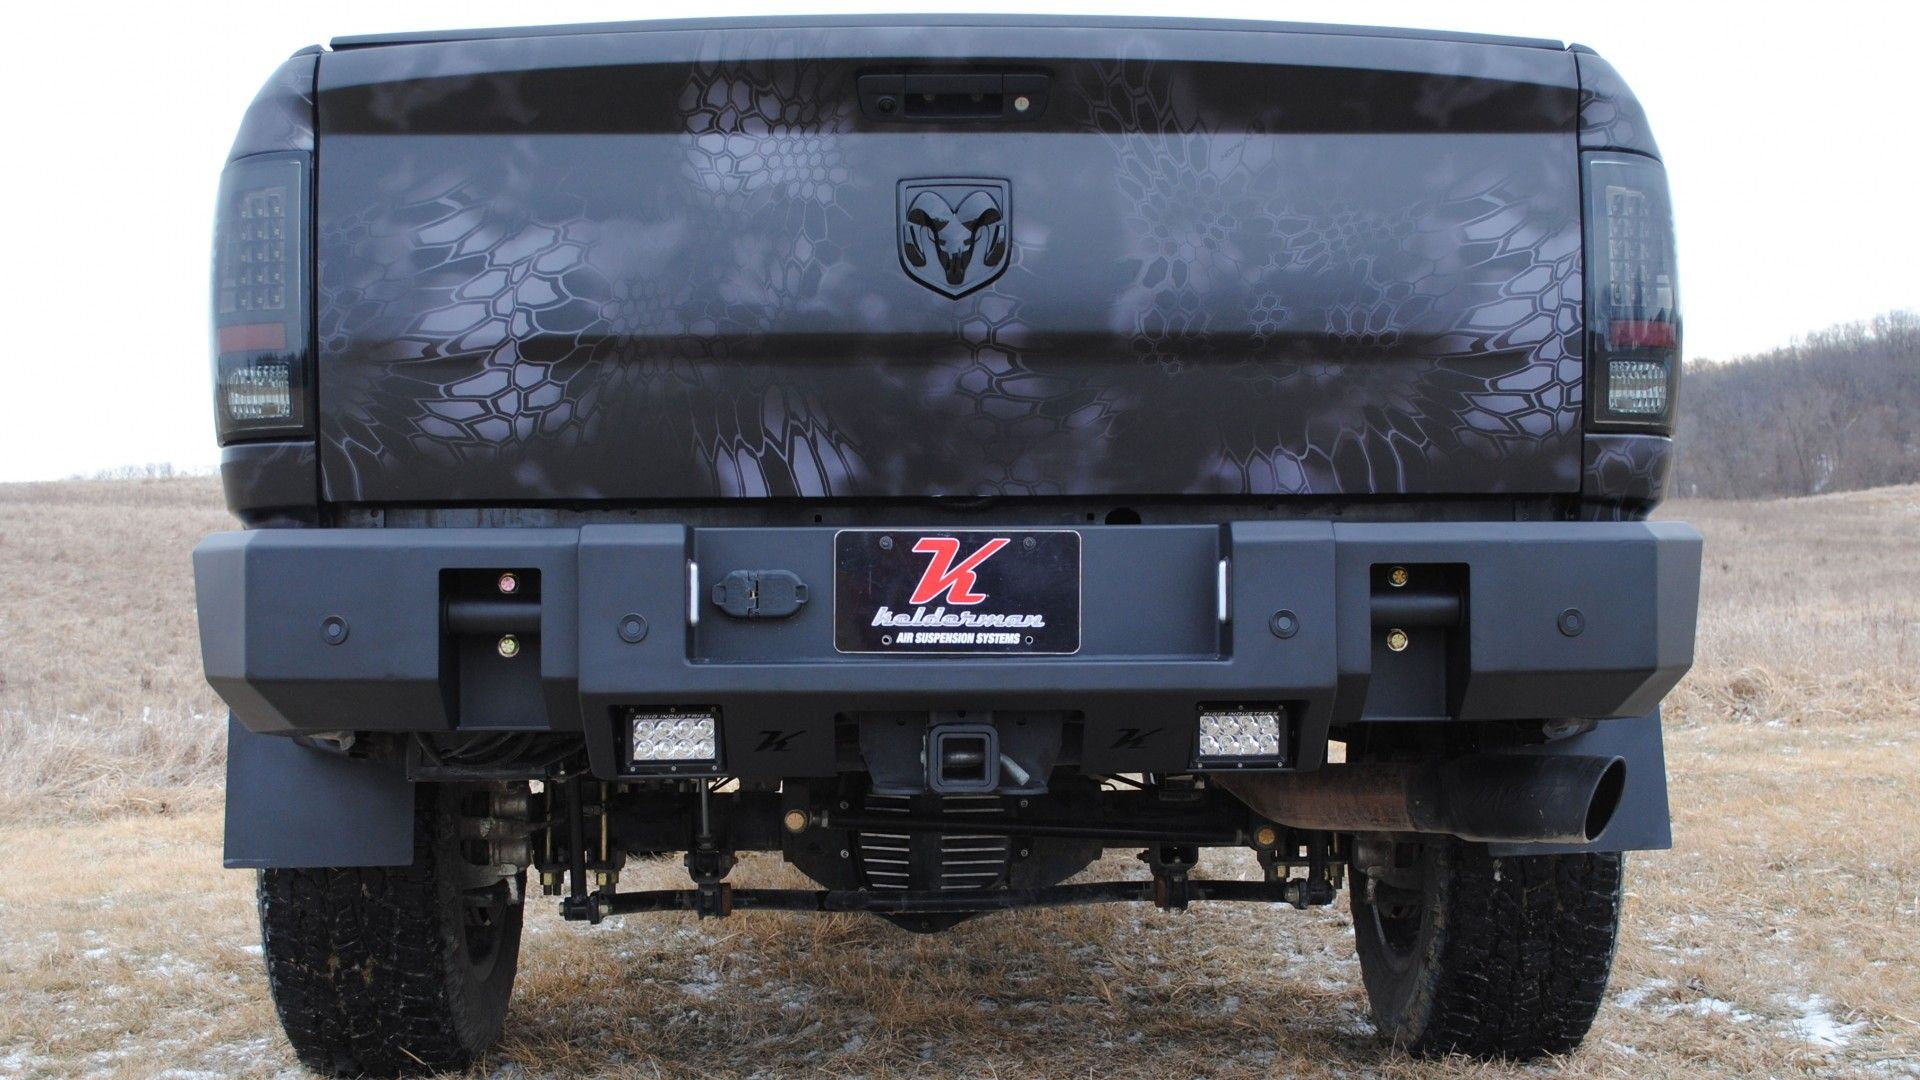 Kelderman Ram 2500, Bumpers